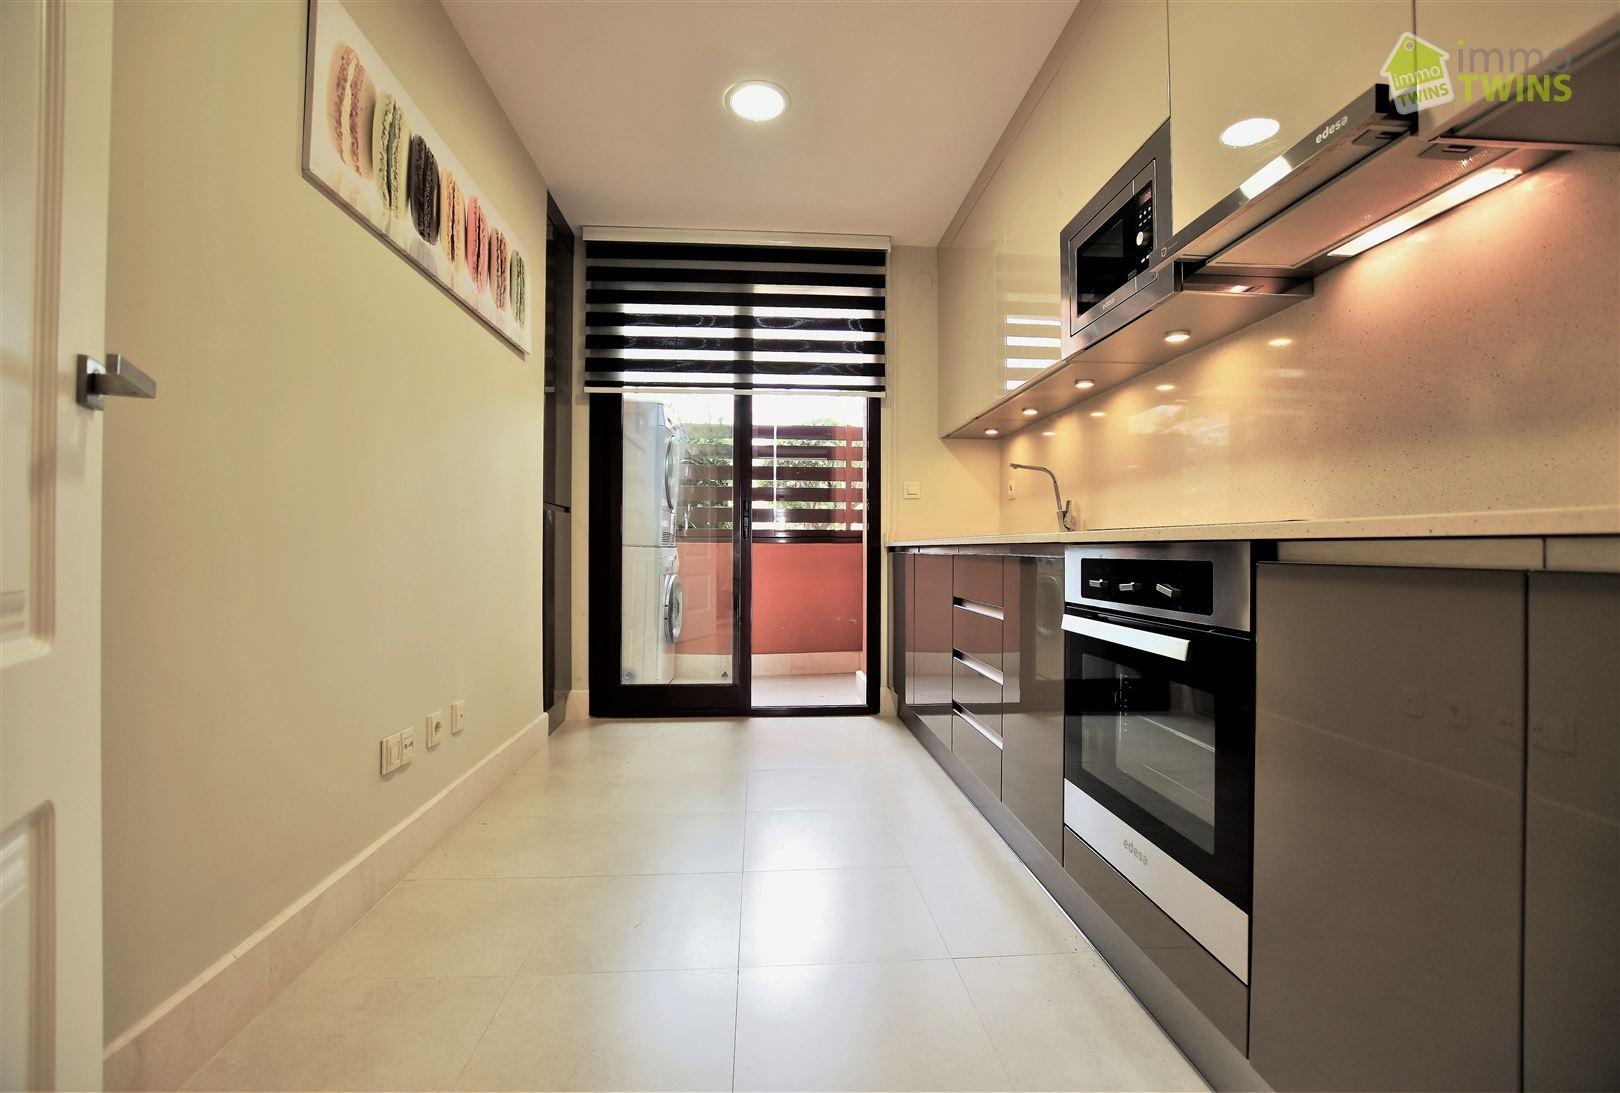 Foto 15 : Appartement te 29679 MARBELLA (Spanje) - Prijs € 485.000